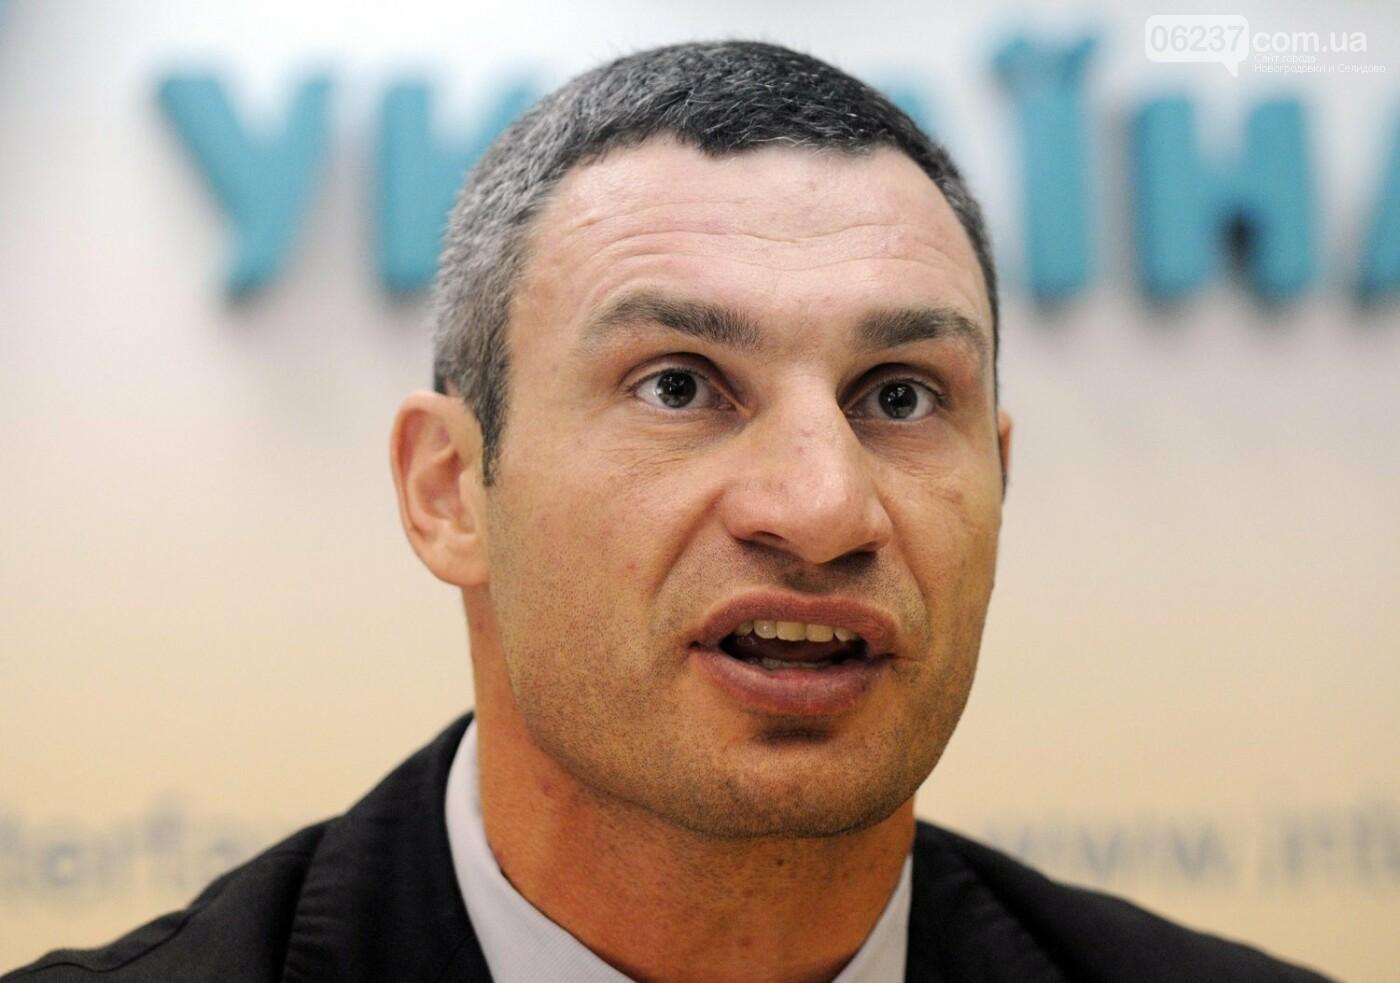 НАБУ открыло уголовное дело против Виталия Кличко, фото-1